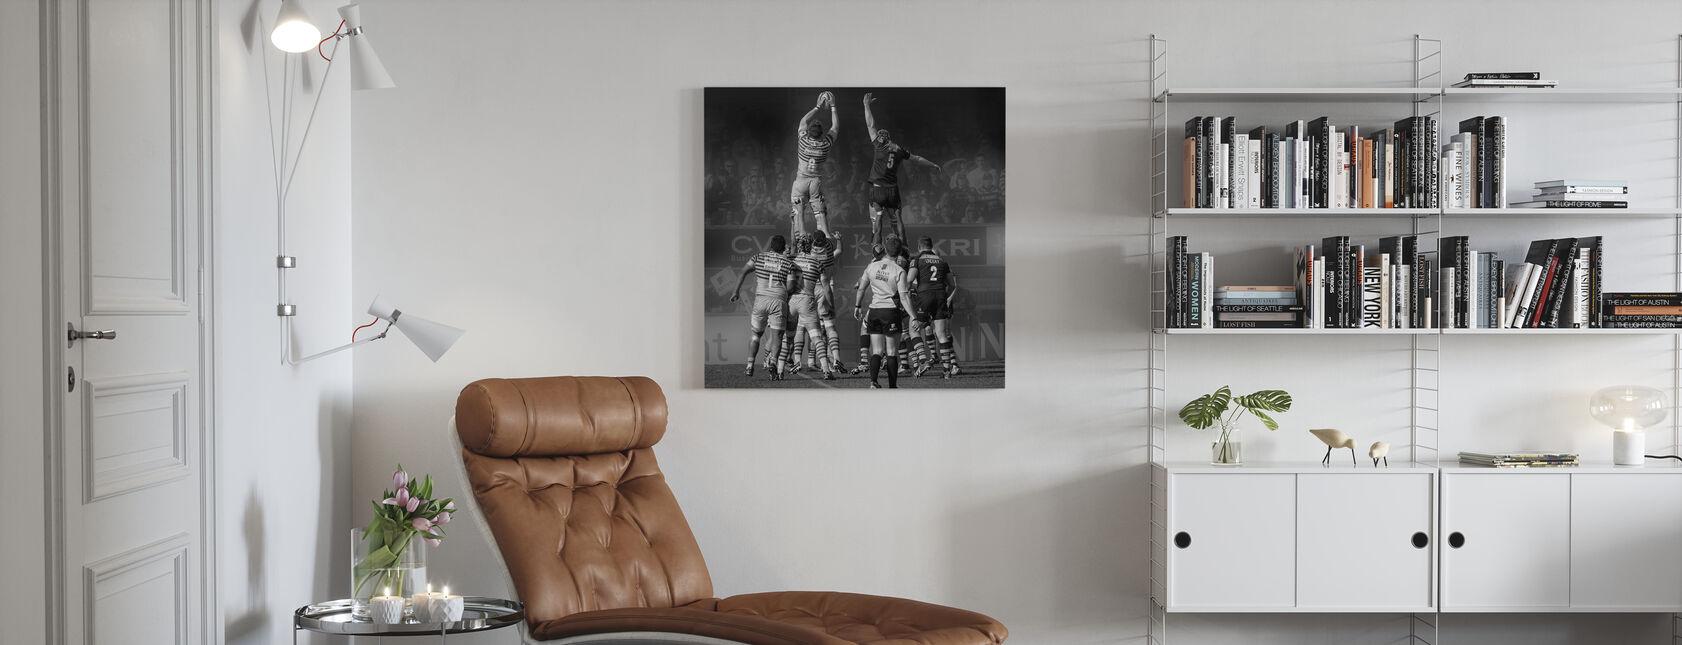 8 vs 5 - Canvas print - Living Room